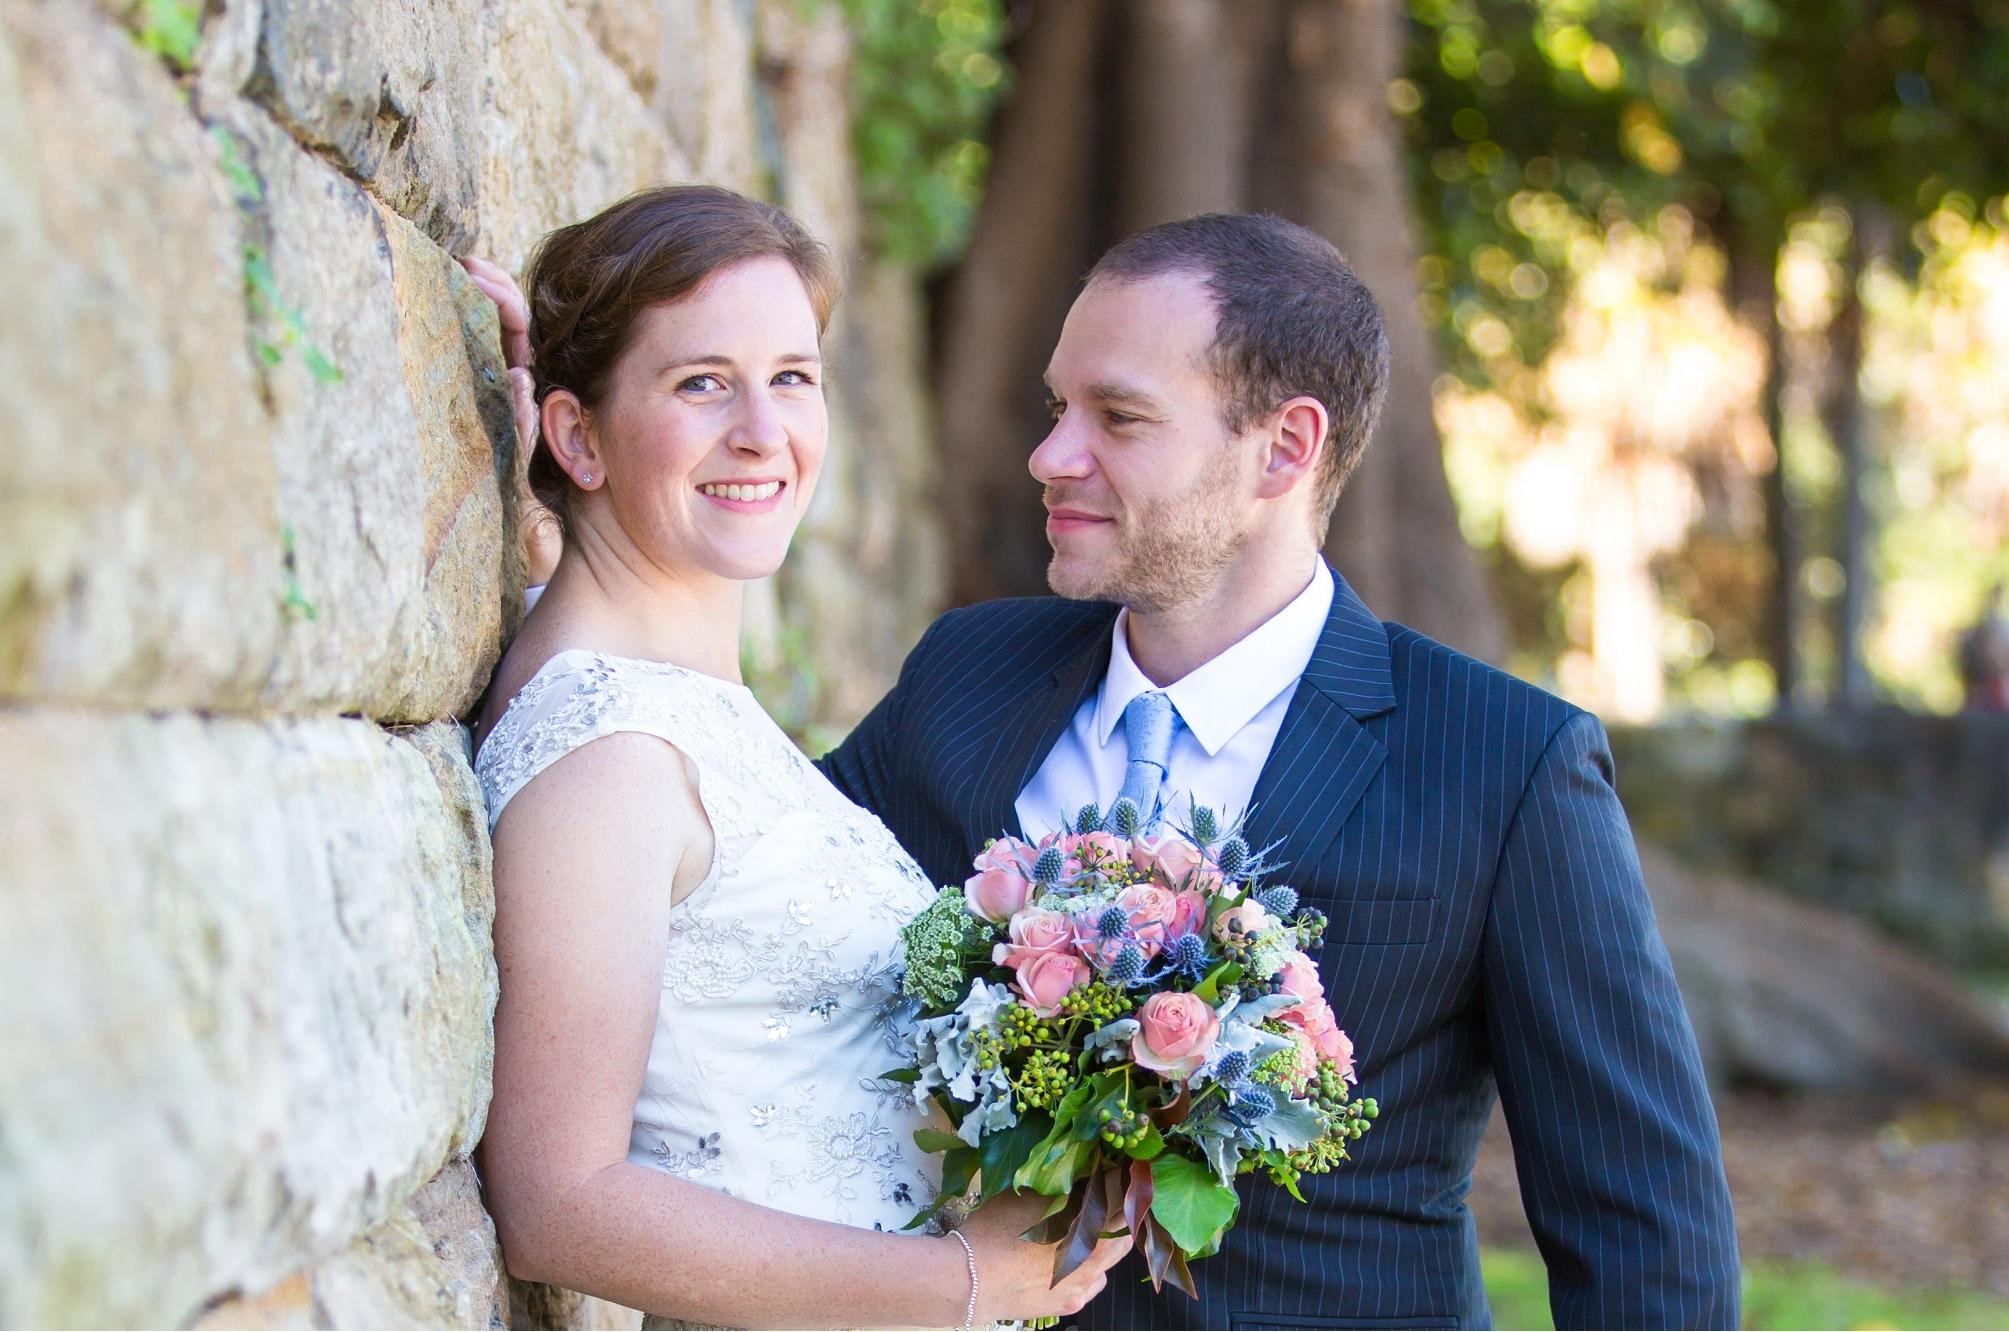 Sydney Wedding Photographer - Jennifer Lam Photography 4.jpg